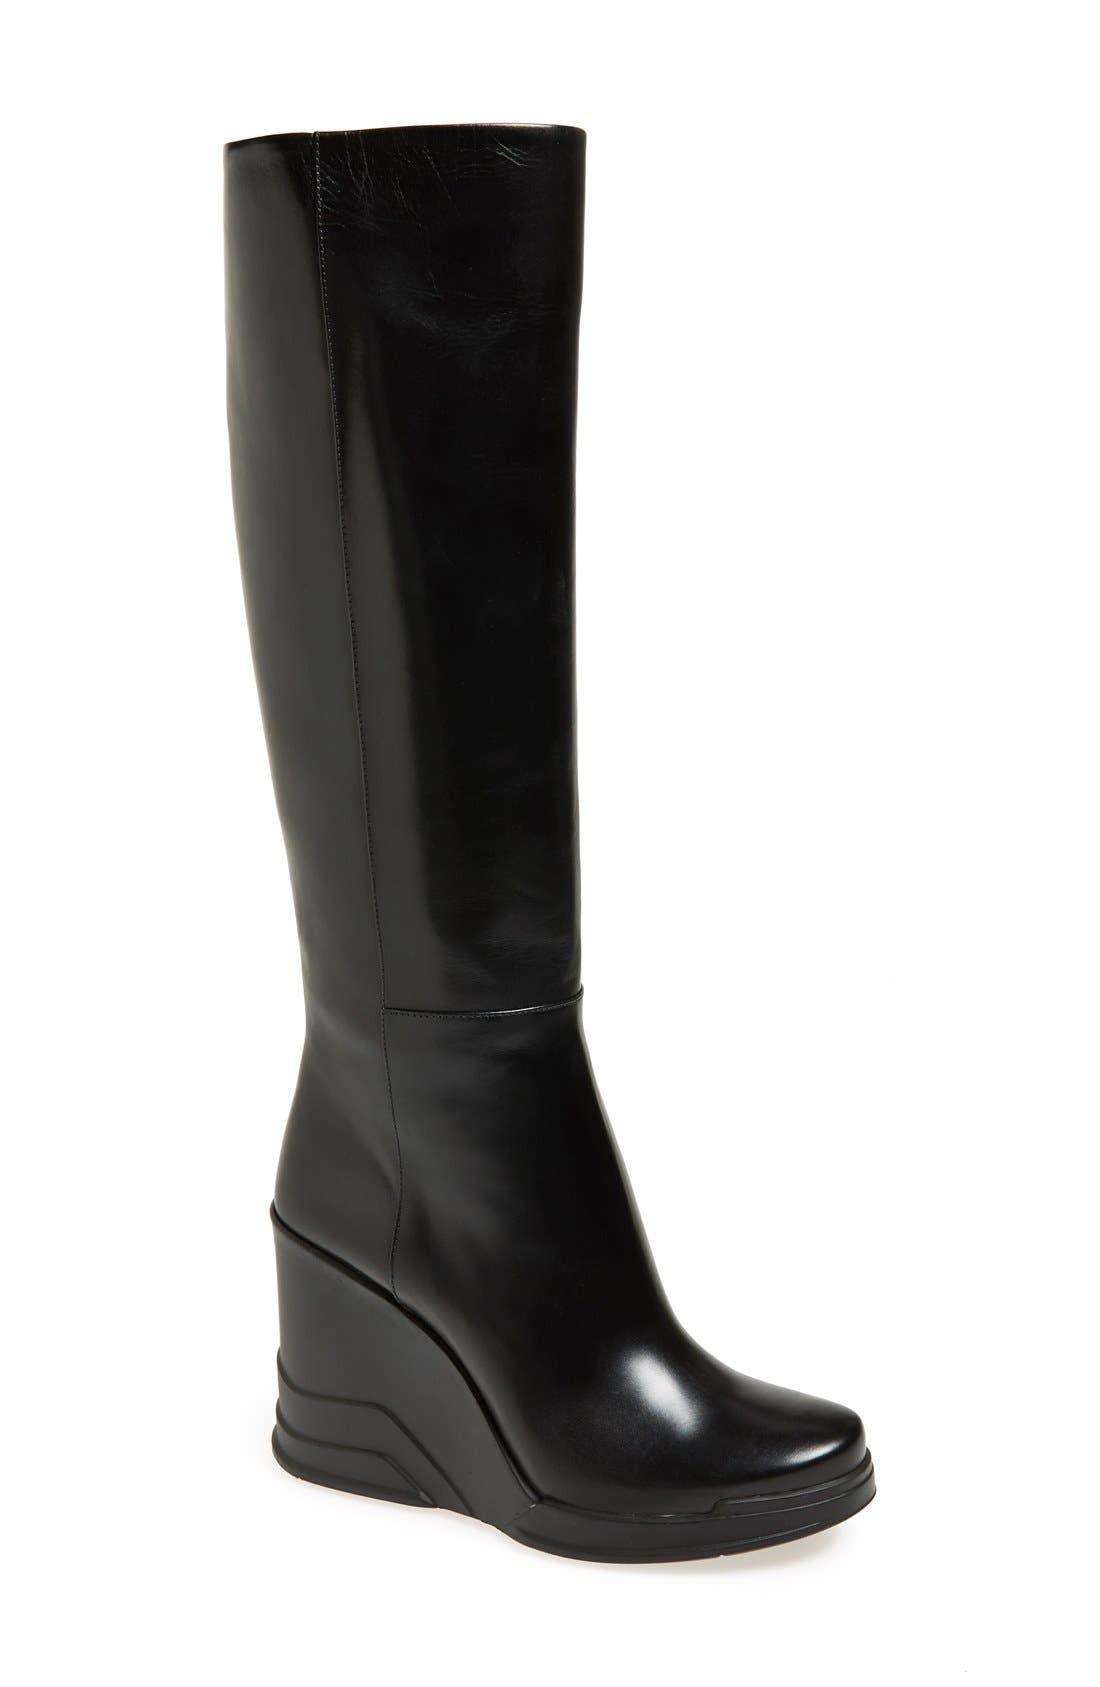 Alternate Image 1 Selected - Prada Knee High Wedge Boot (Women)